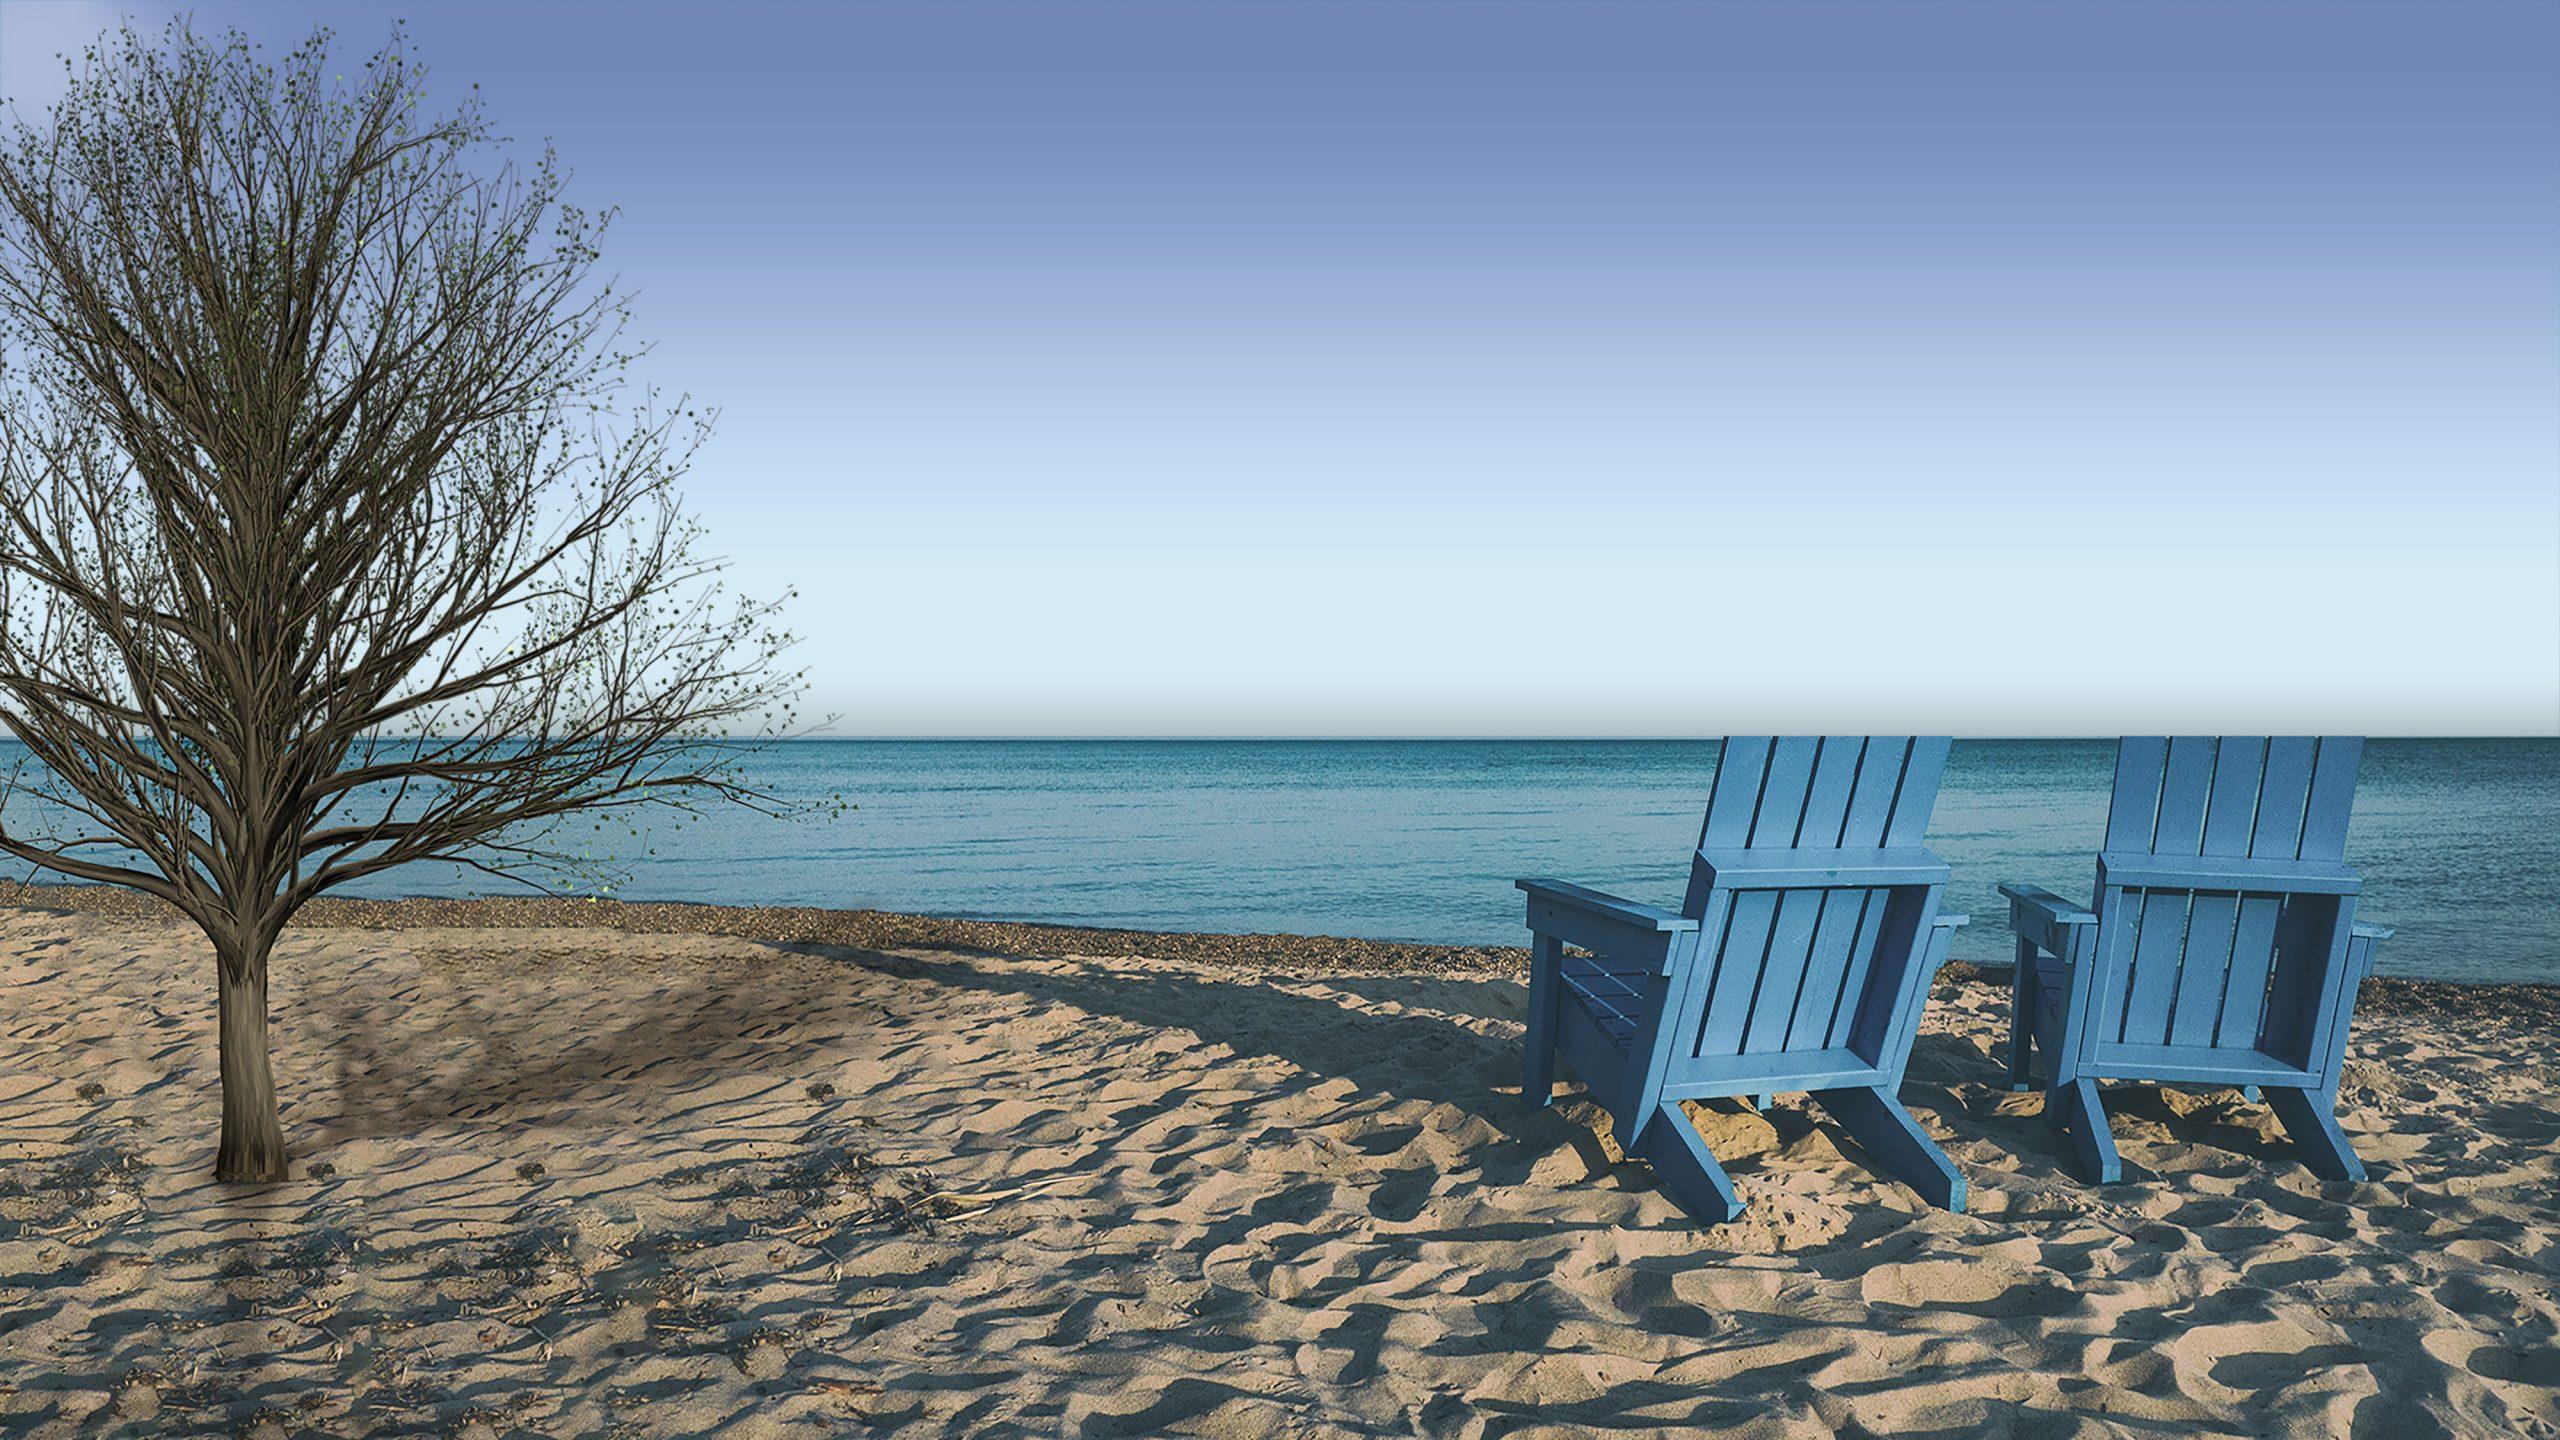 beachside-evening-tree-background